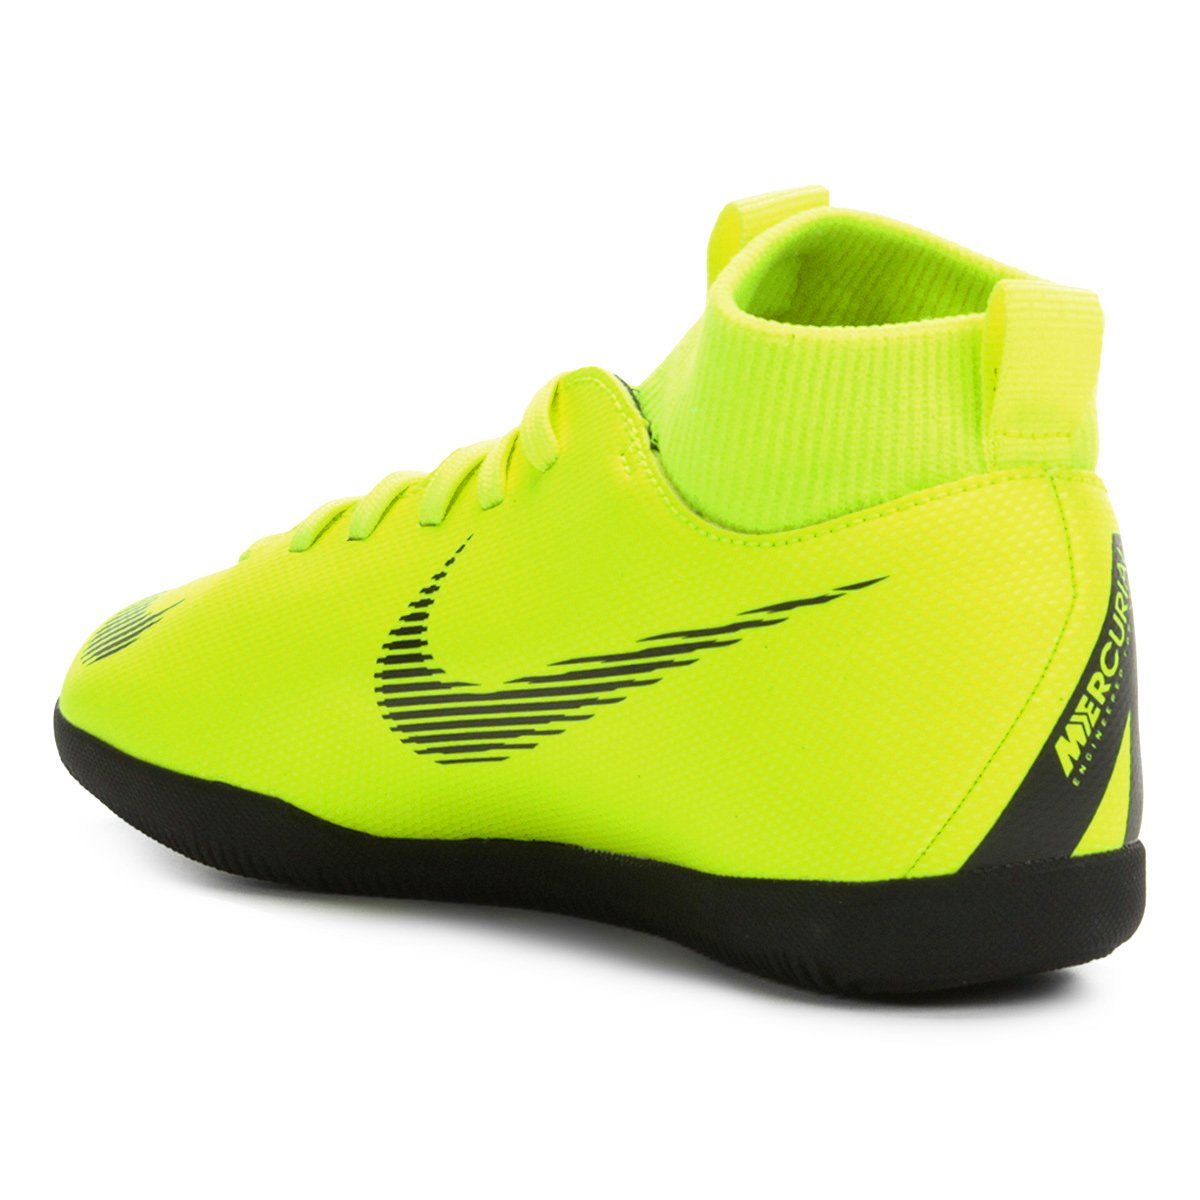 Chuteira Futsal Infantil Nike Mercurial Superfly 6 Club - Compre ... 3a990c7ced97a